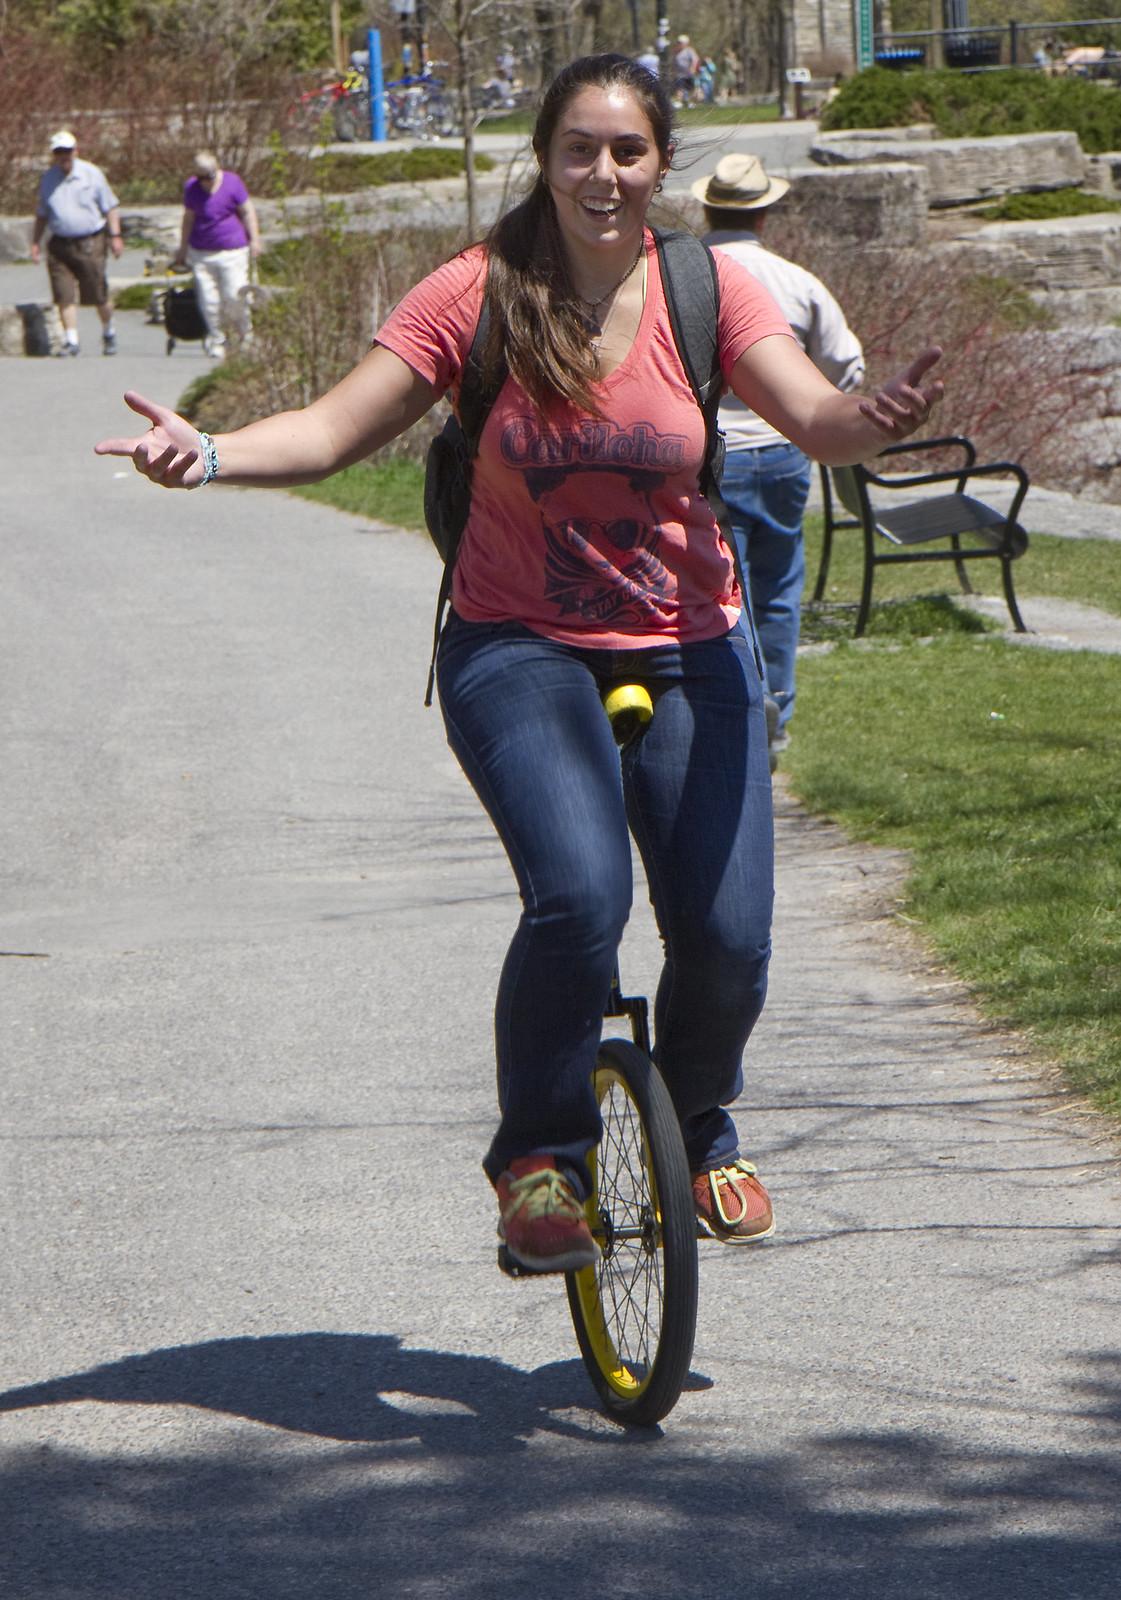 unicyclist9